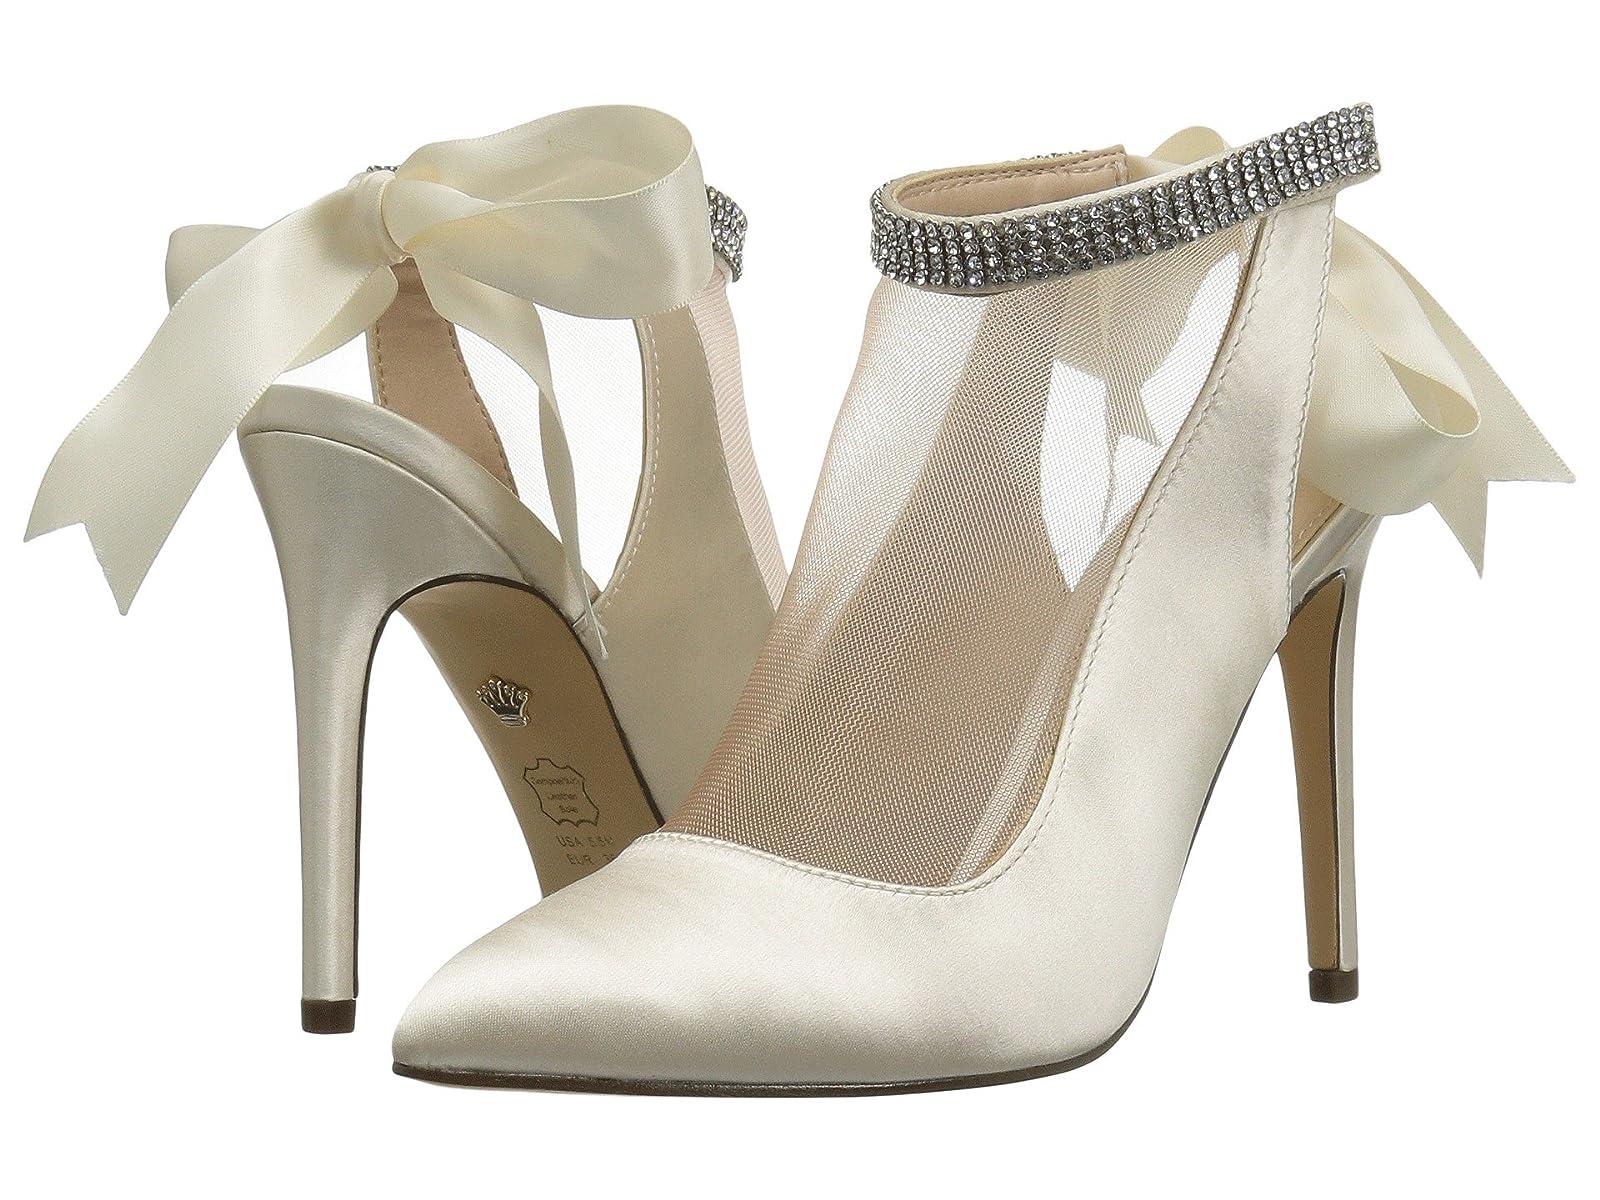 Nina RosanaCheap and distinctive eye-catching shoes